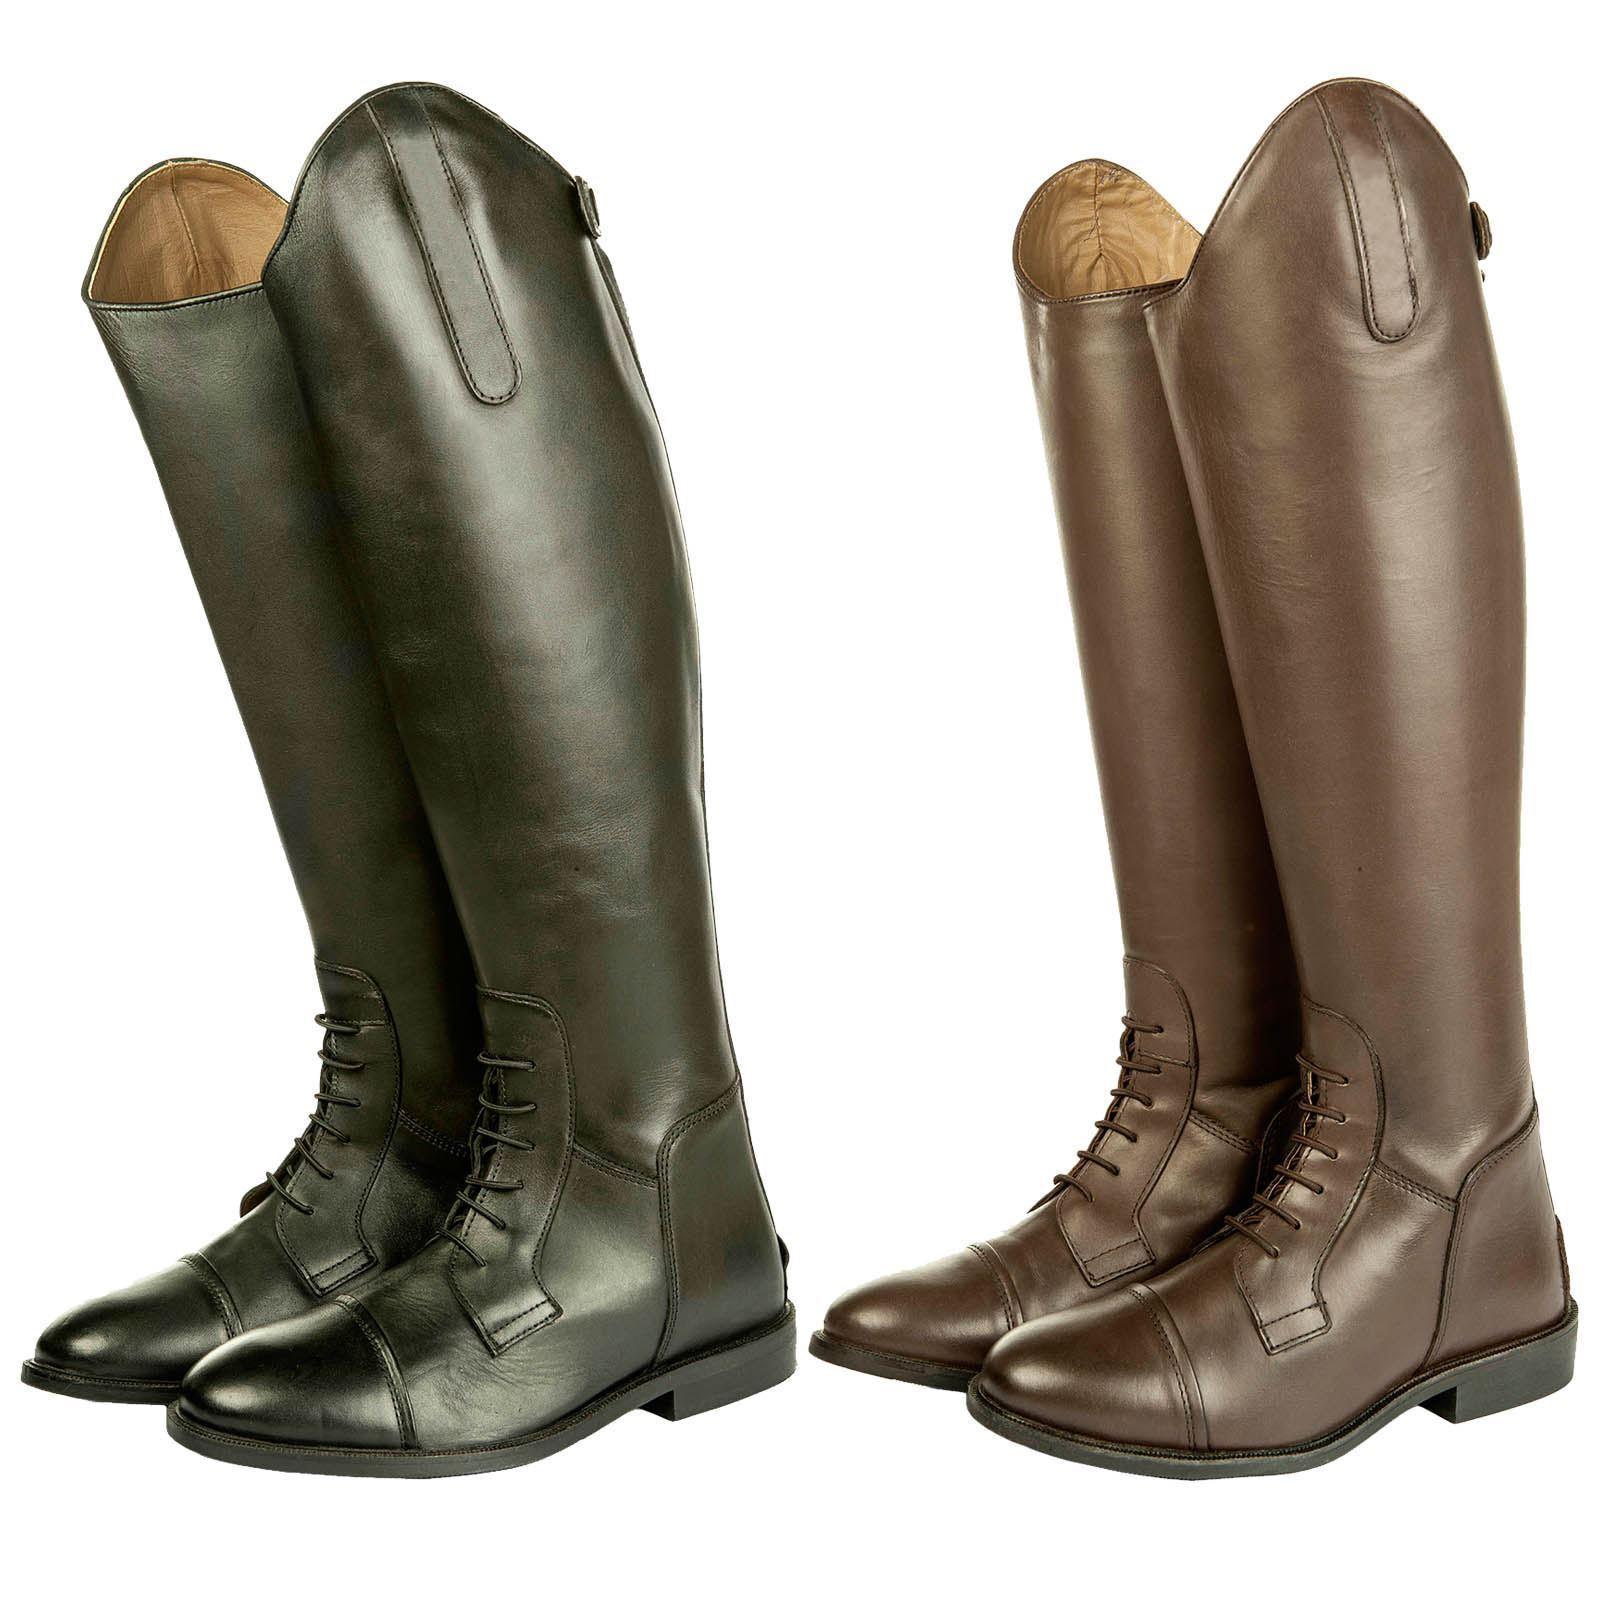 HKM Erwachsene Spanien Soft Leather Slim Standard Long Horse Riding Stiefel